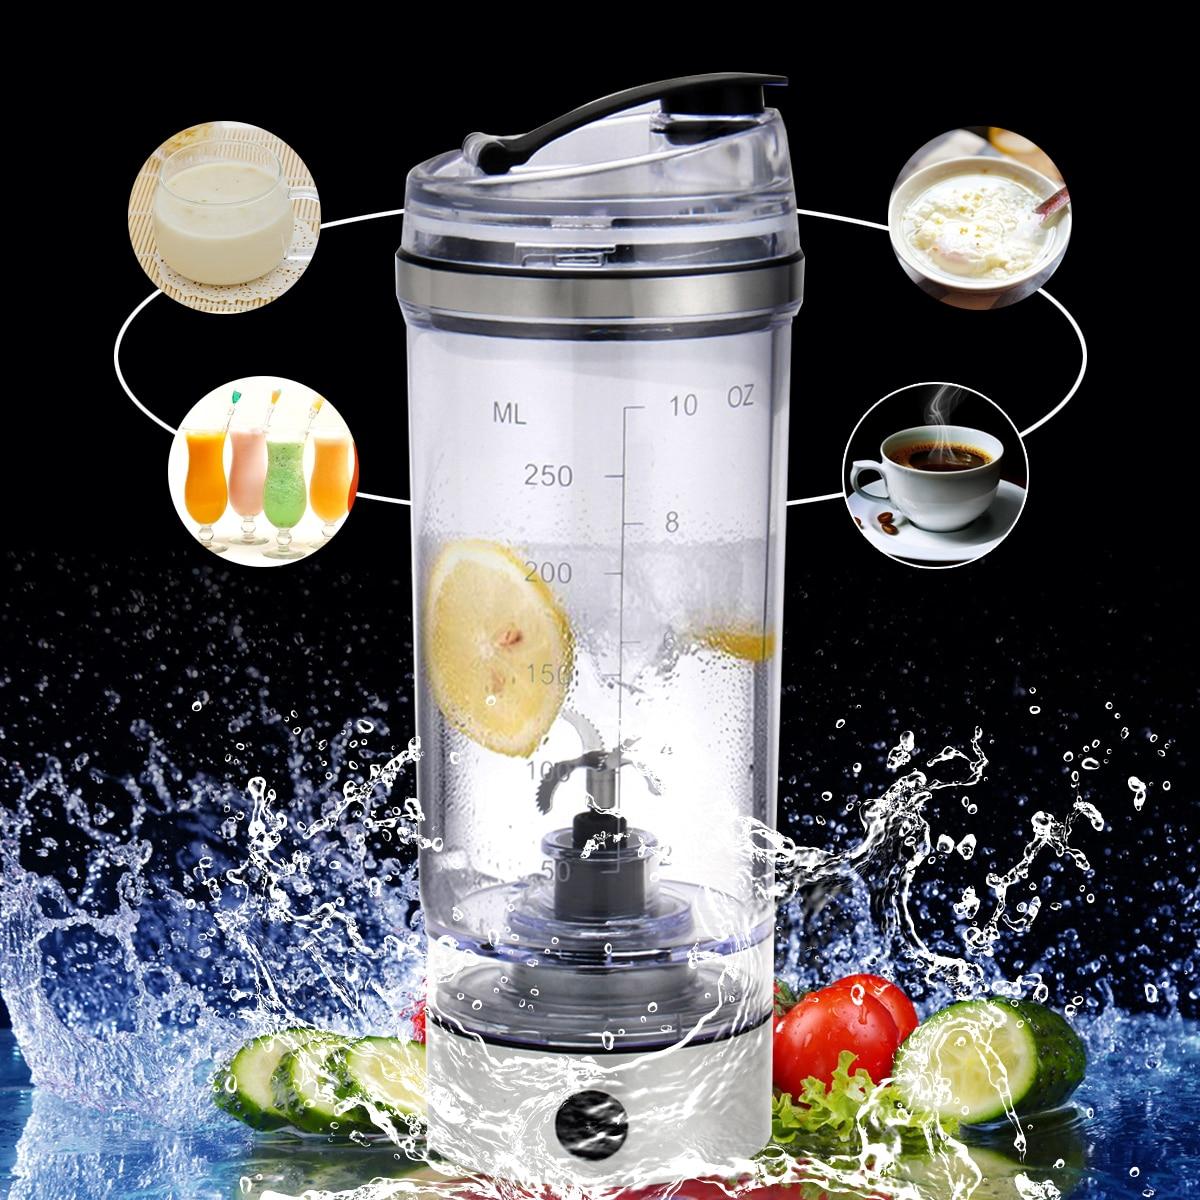 Hf638d7f82e764ffaabb9172af6342fafK 2019 250ML Electric Protein Shake Stirrer USB Shake Bottle Milk Coffee Blender Kettle Fitness Vortex Tornado Smart Mixer